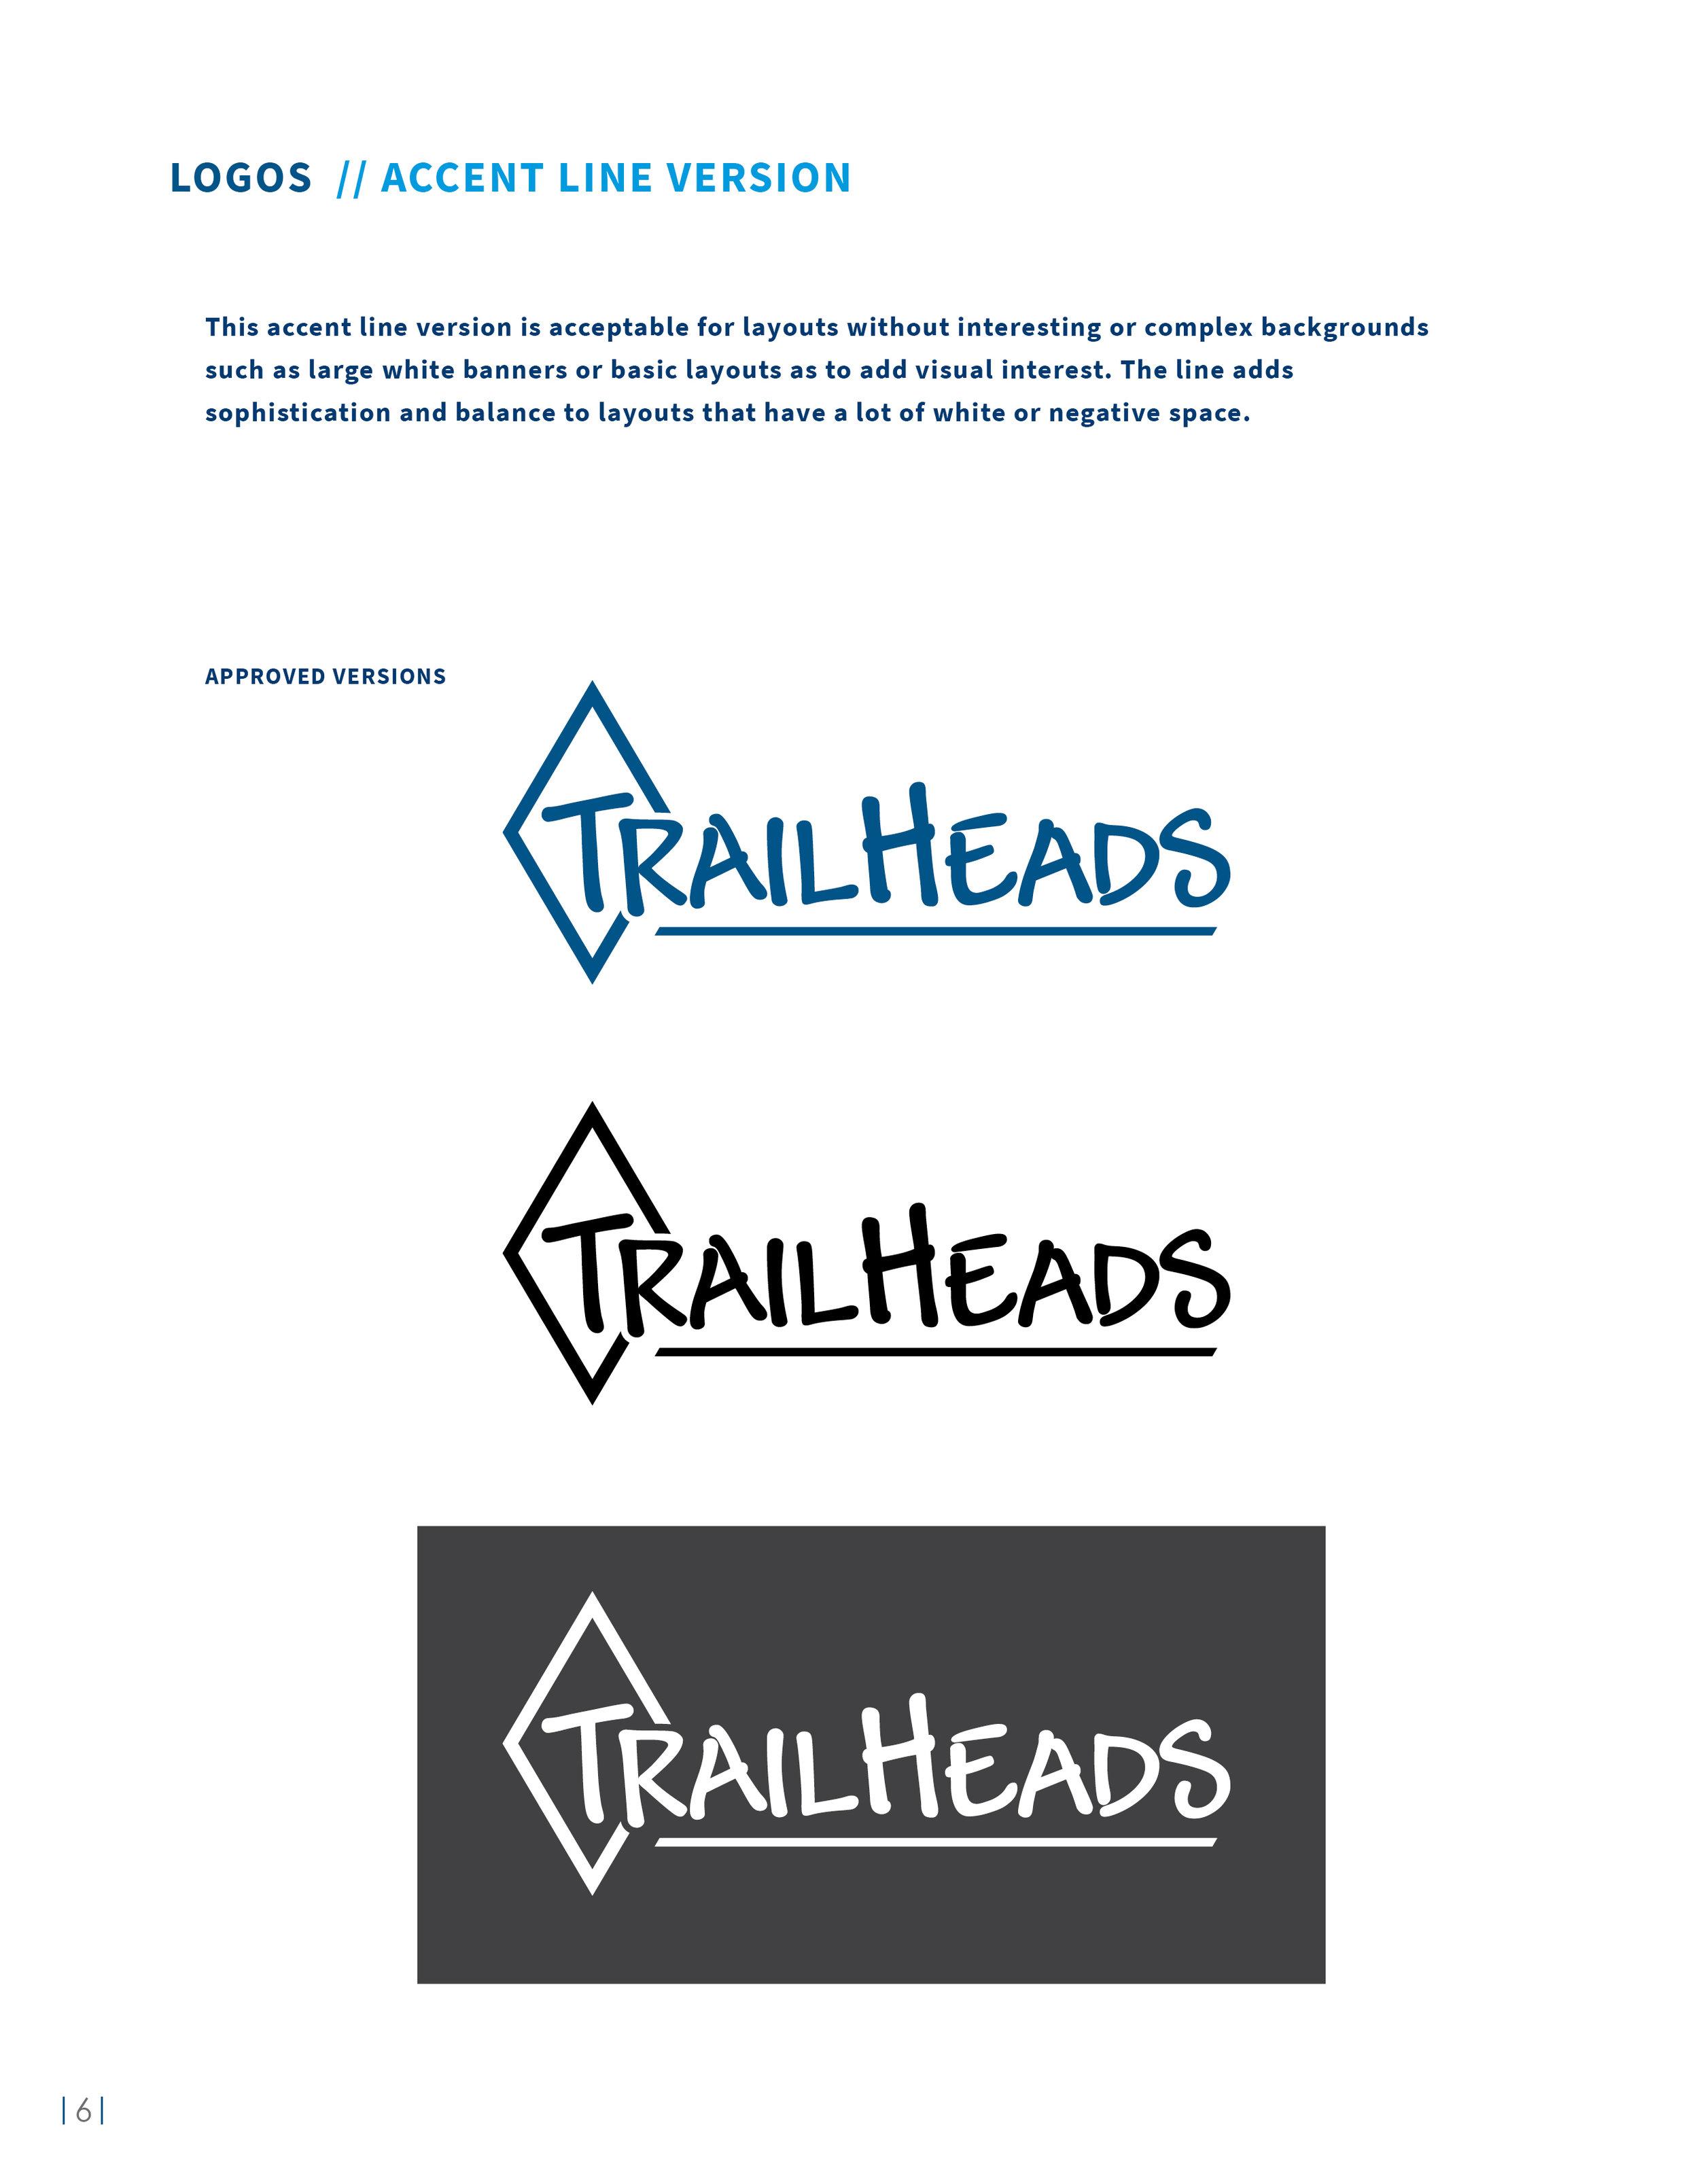 apparel-company-brand-guidelines-design-by-jordan-fretz-design-16.jpg